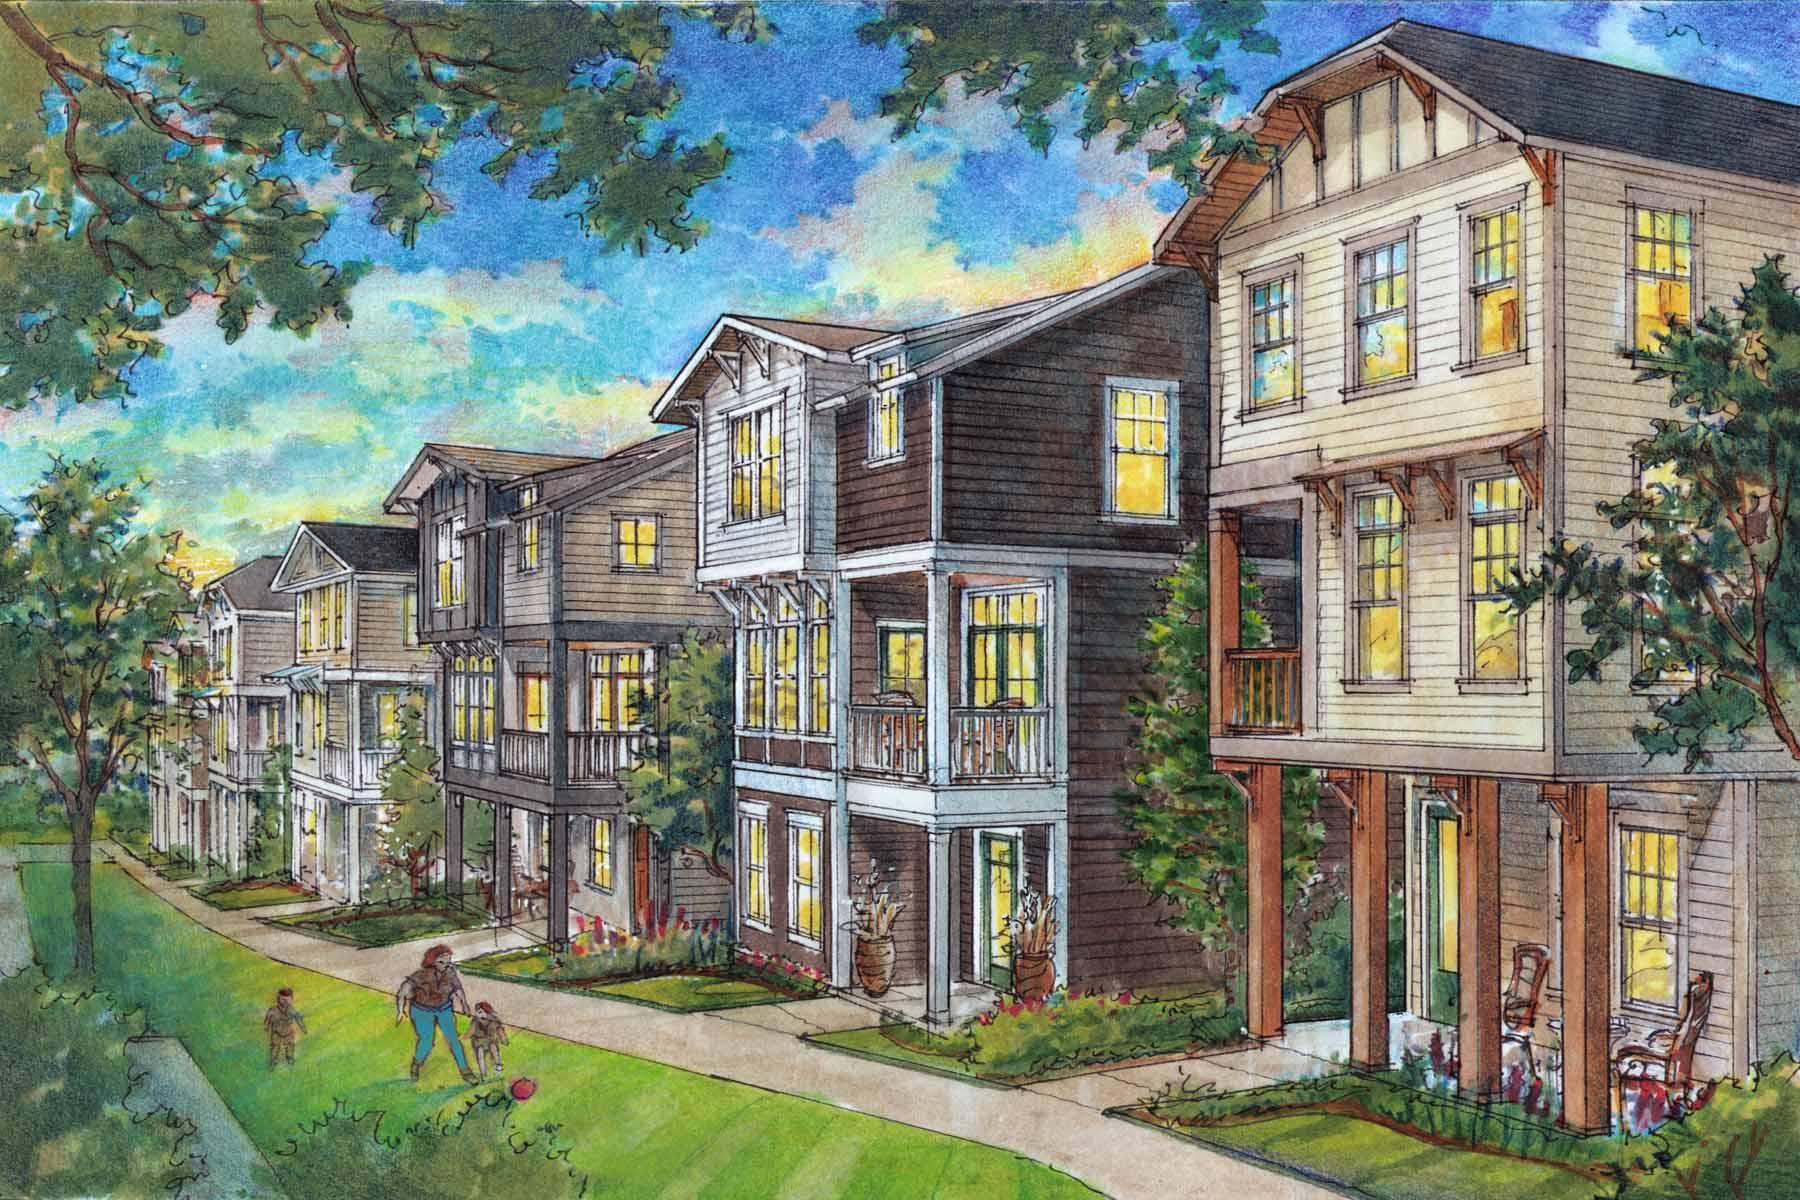 獨棟家庭住宅 為 出售 在 Cottage in The Grove at Avondale 2826 Haven Lane Decatur, 喬治亞州, 30030 美國